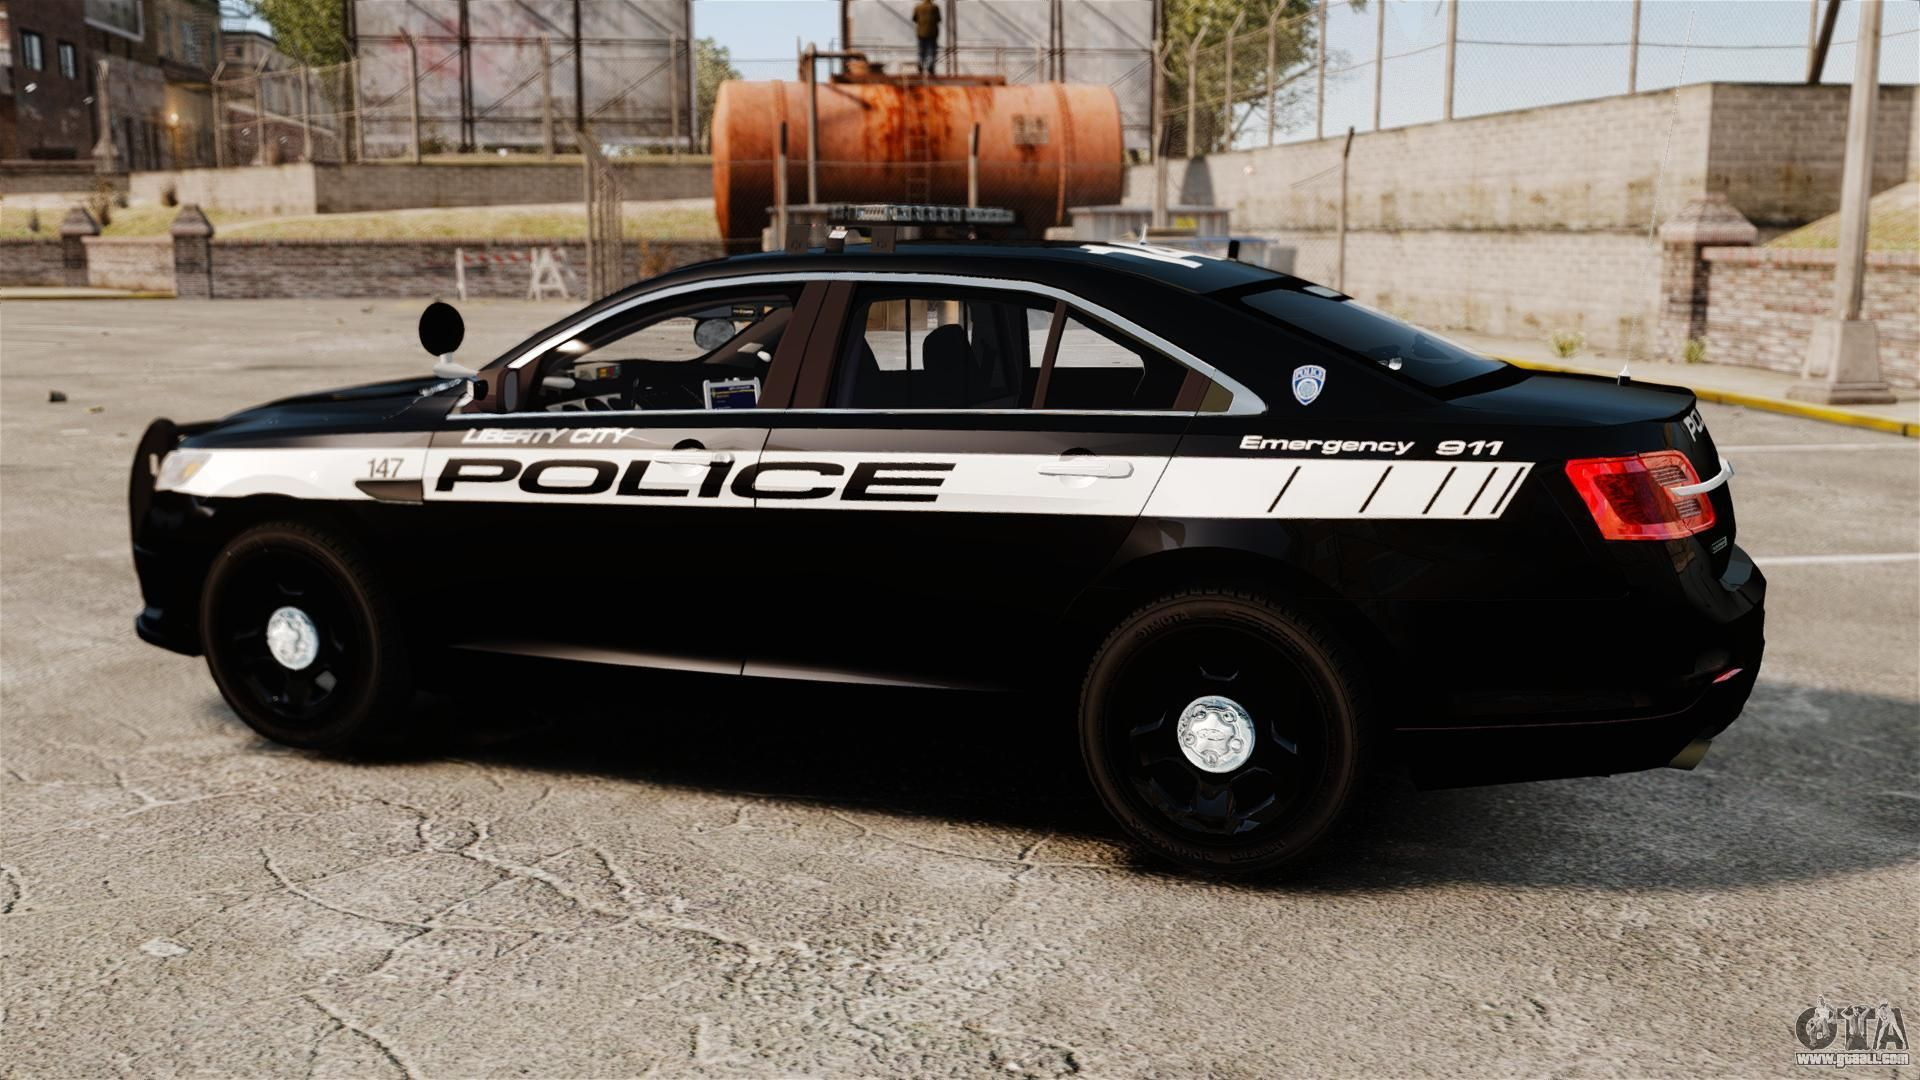 Ford Taurus Coolest Police Car 2 & Ford Taurus Coolest Police Car 2 | The Greatest Ford Taurus ... markmcfarlin.com